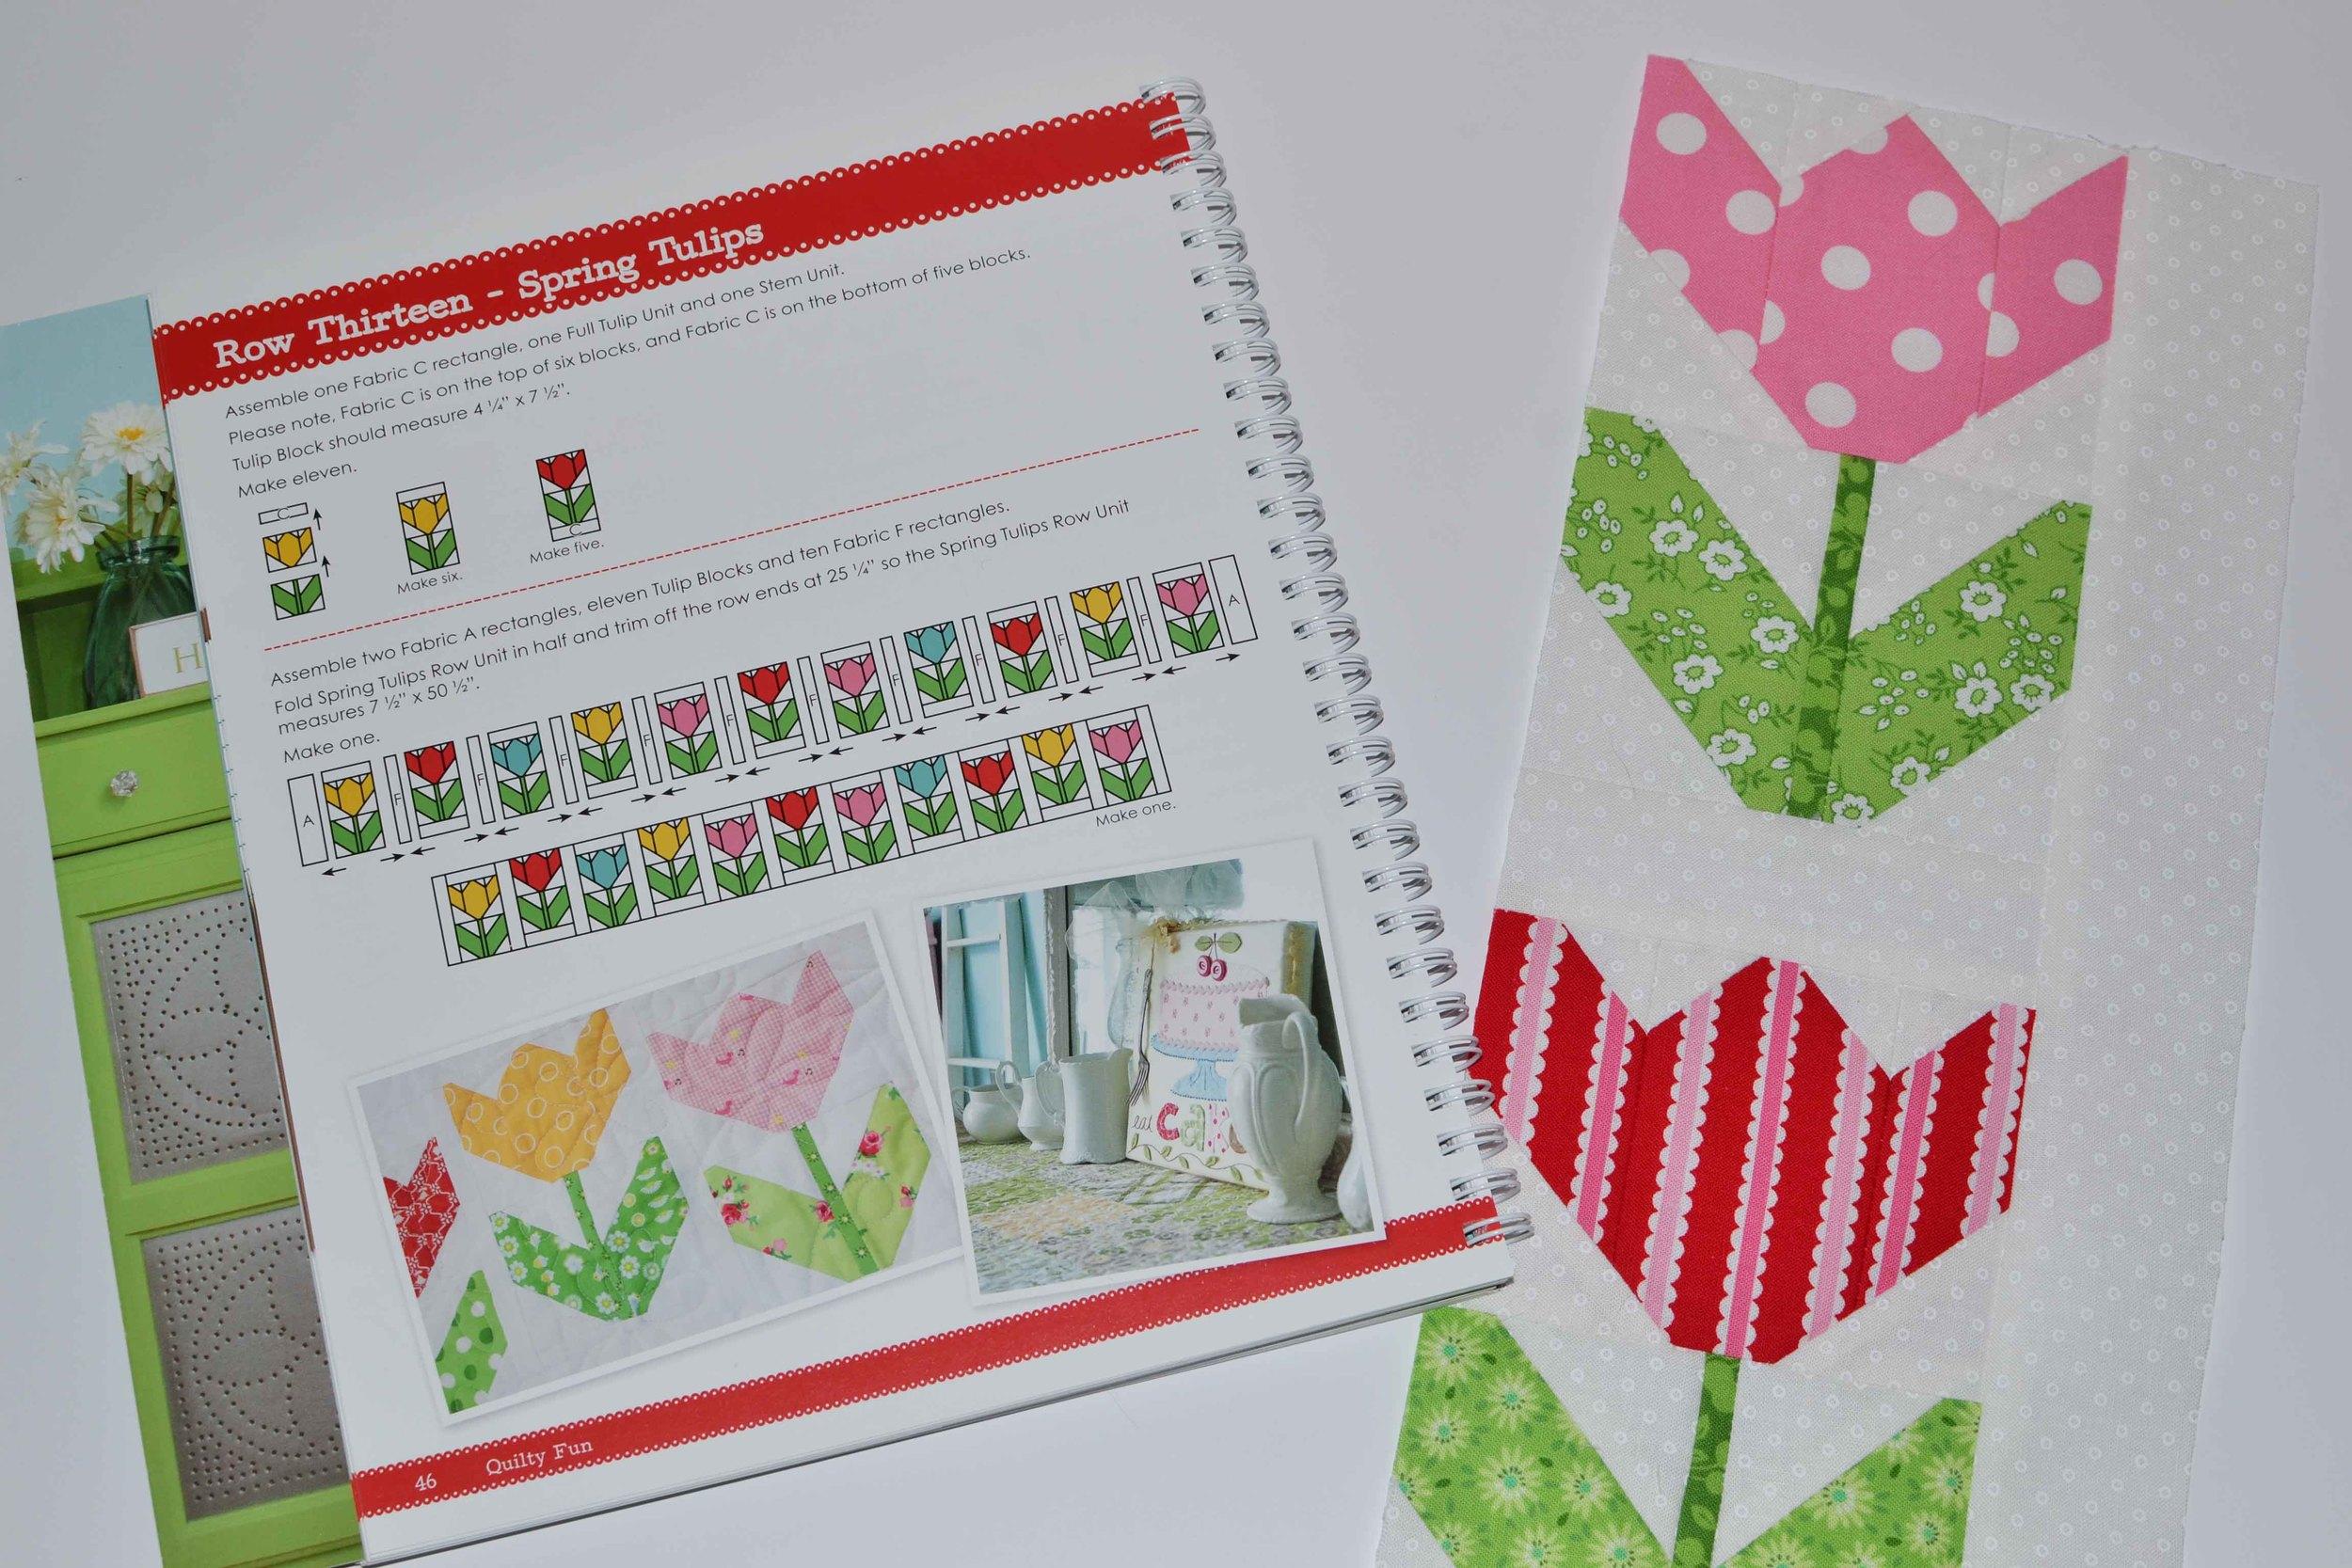 quilty fun spring tulips 011 enhanced.jpg